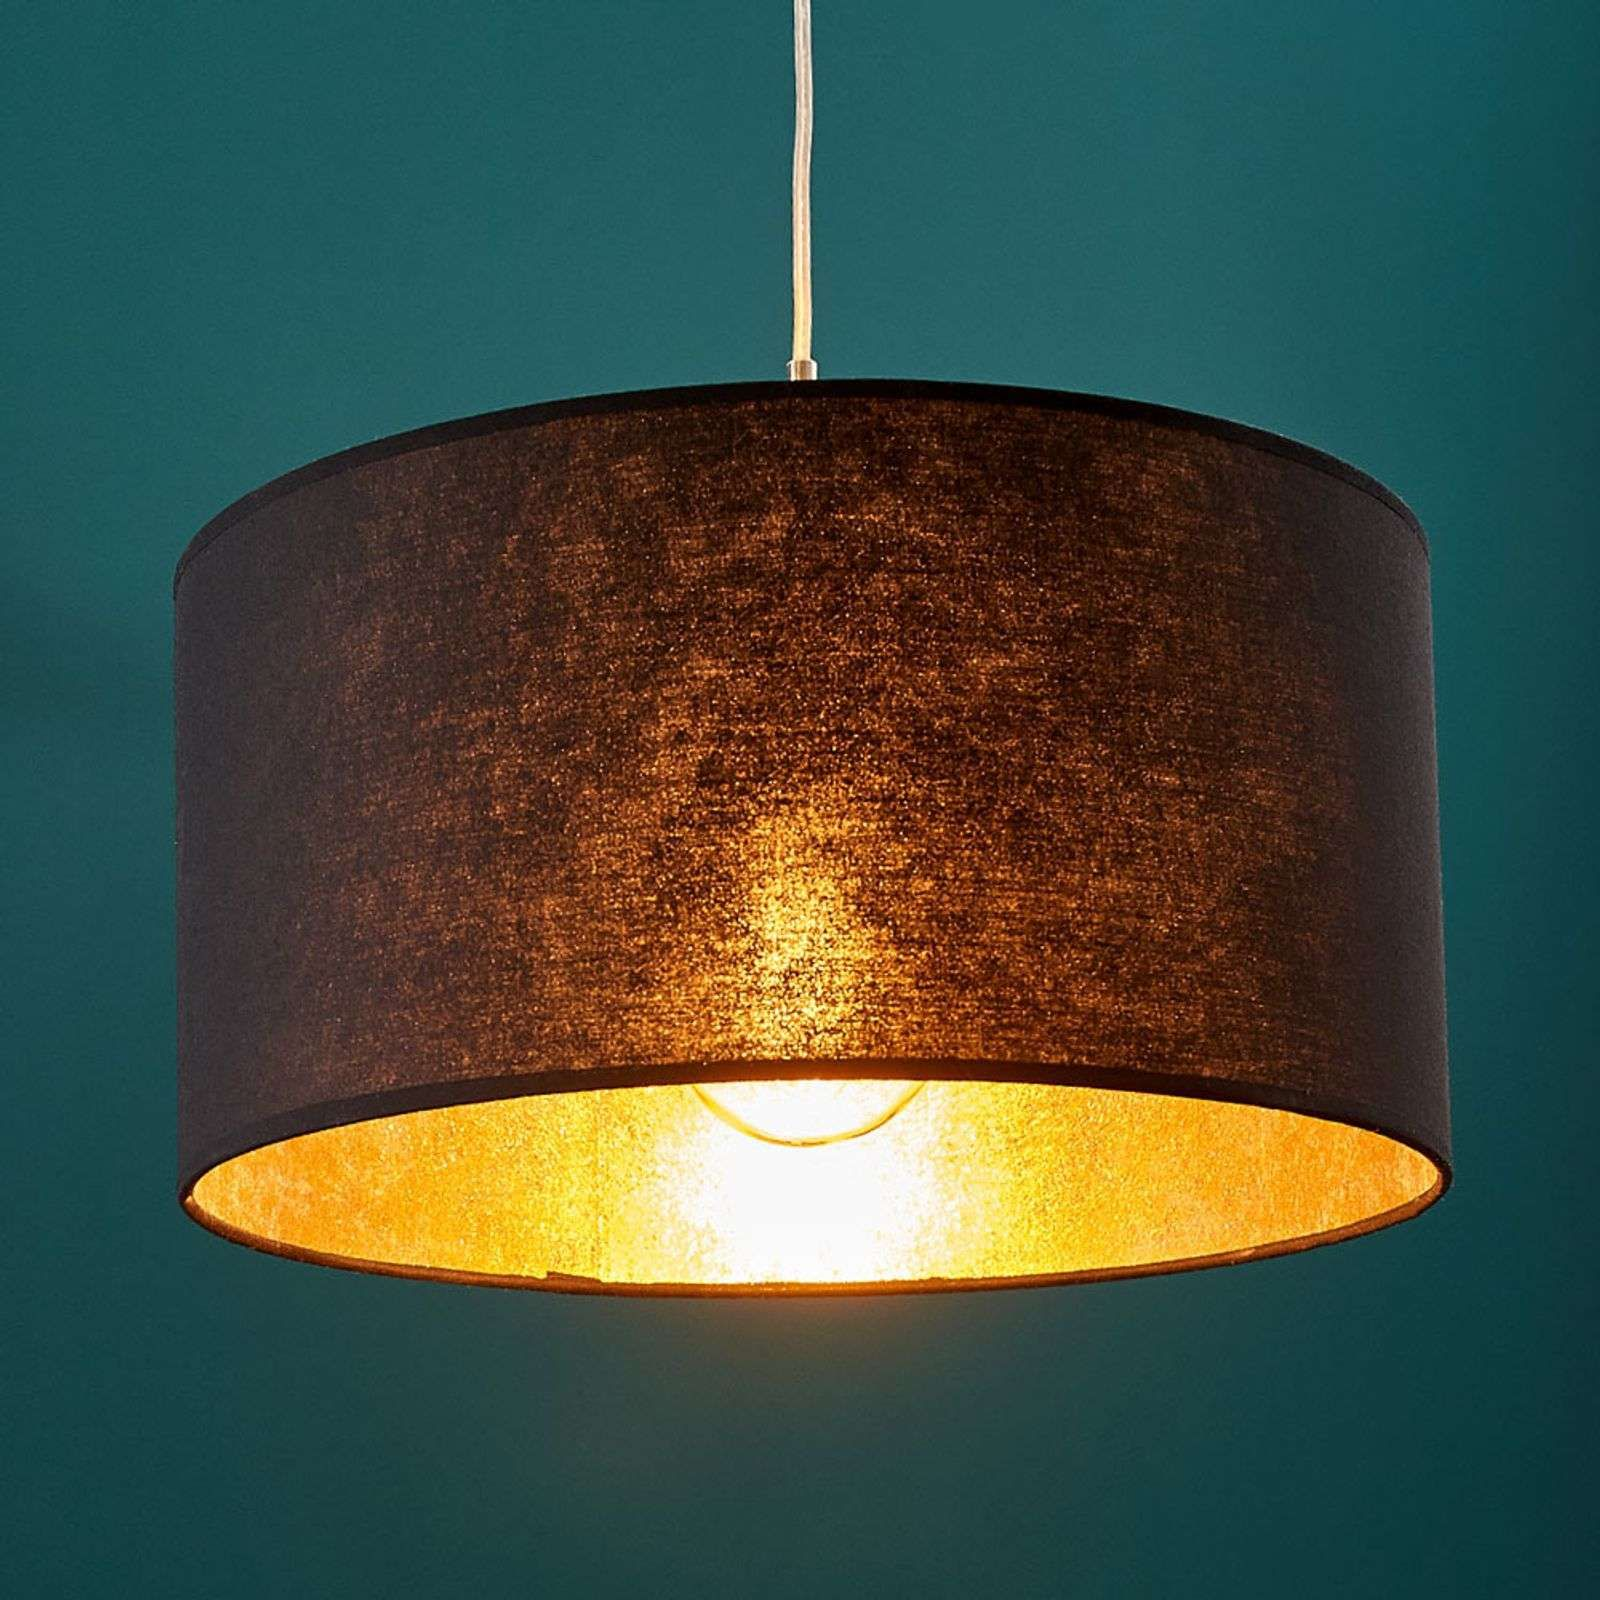 Black Gold Pendant Light Salma Round By Lampenwelt Com In 2021 Pendant Light Gold Pendant Lighting Lamp